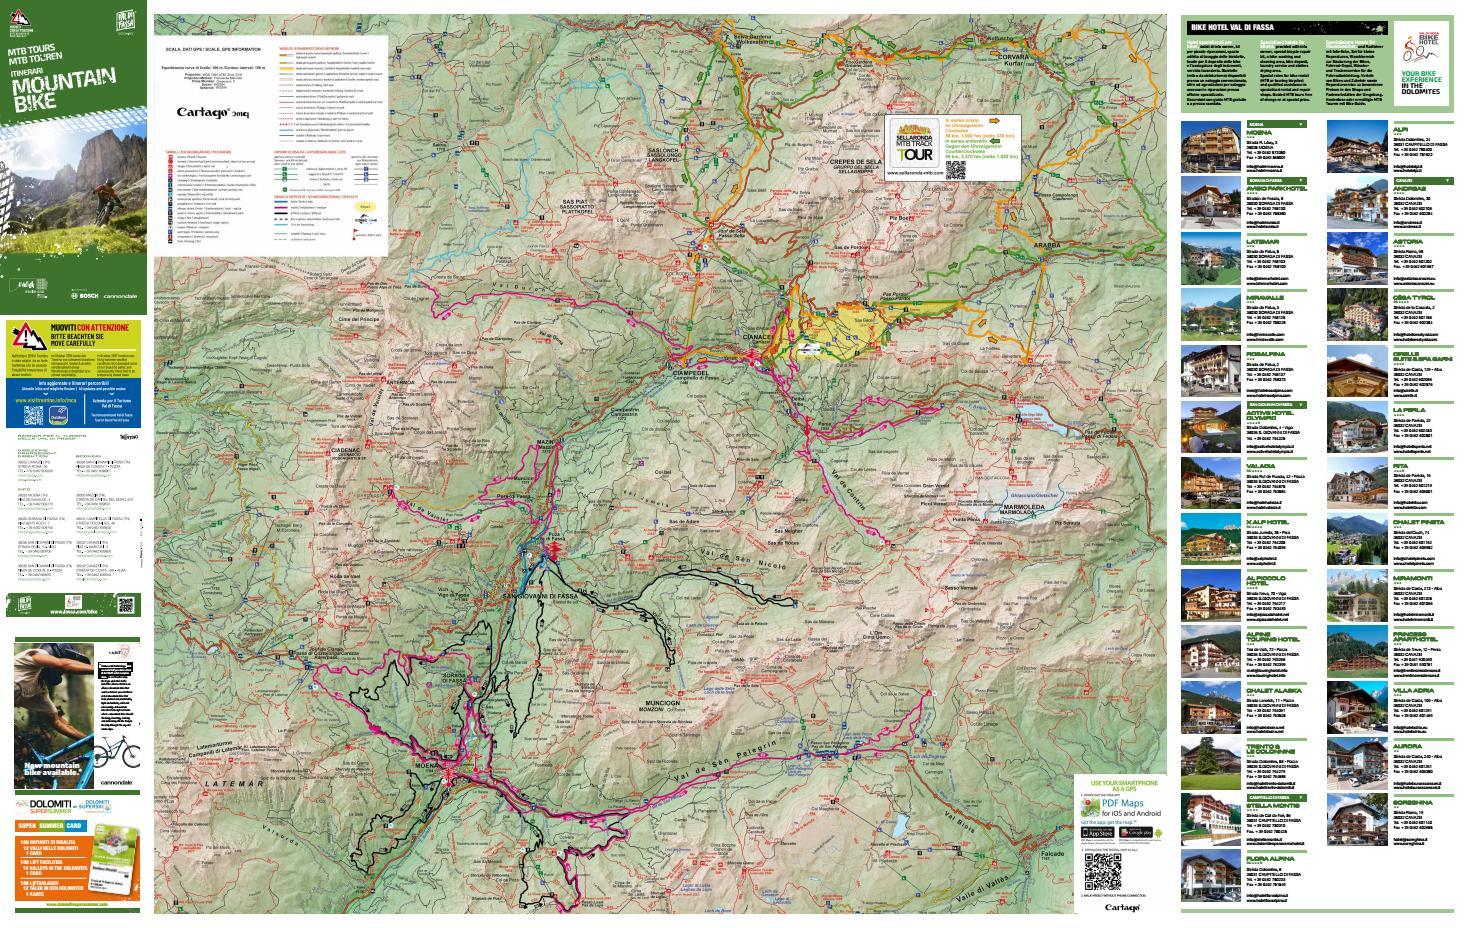 Cartina itinerari mountain bike 2019 by APT Val di Fassa - issuu